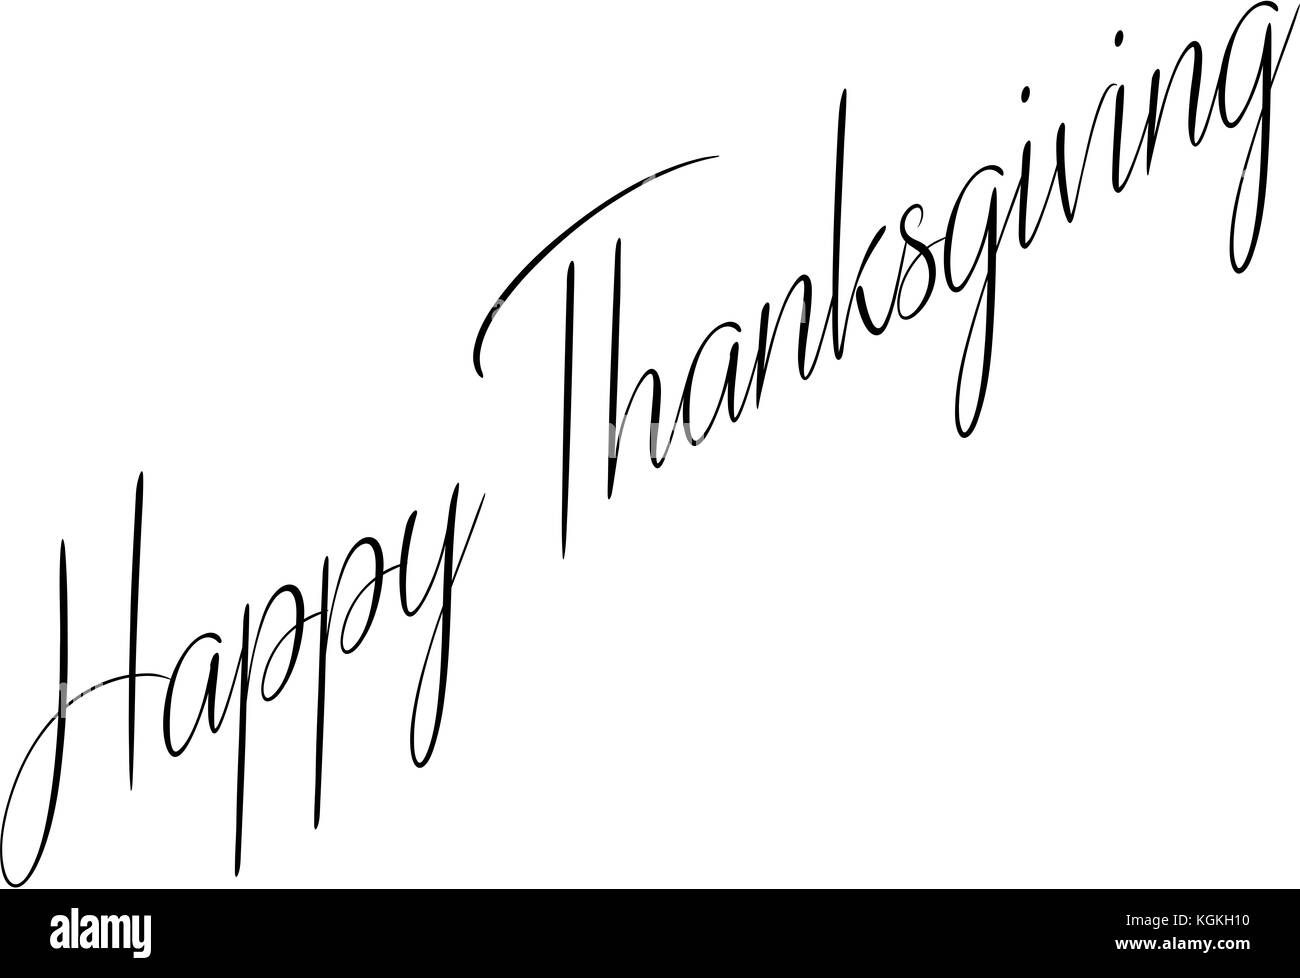 Happy Thanksgiving text sign illustration on white illustration. Stock Photo